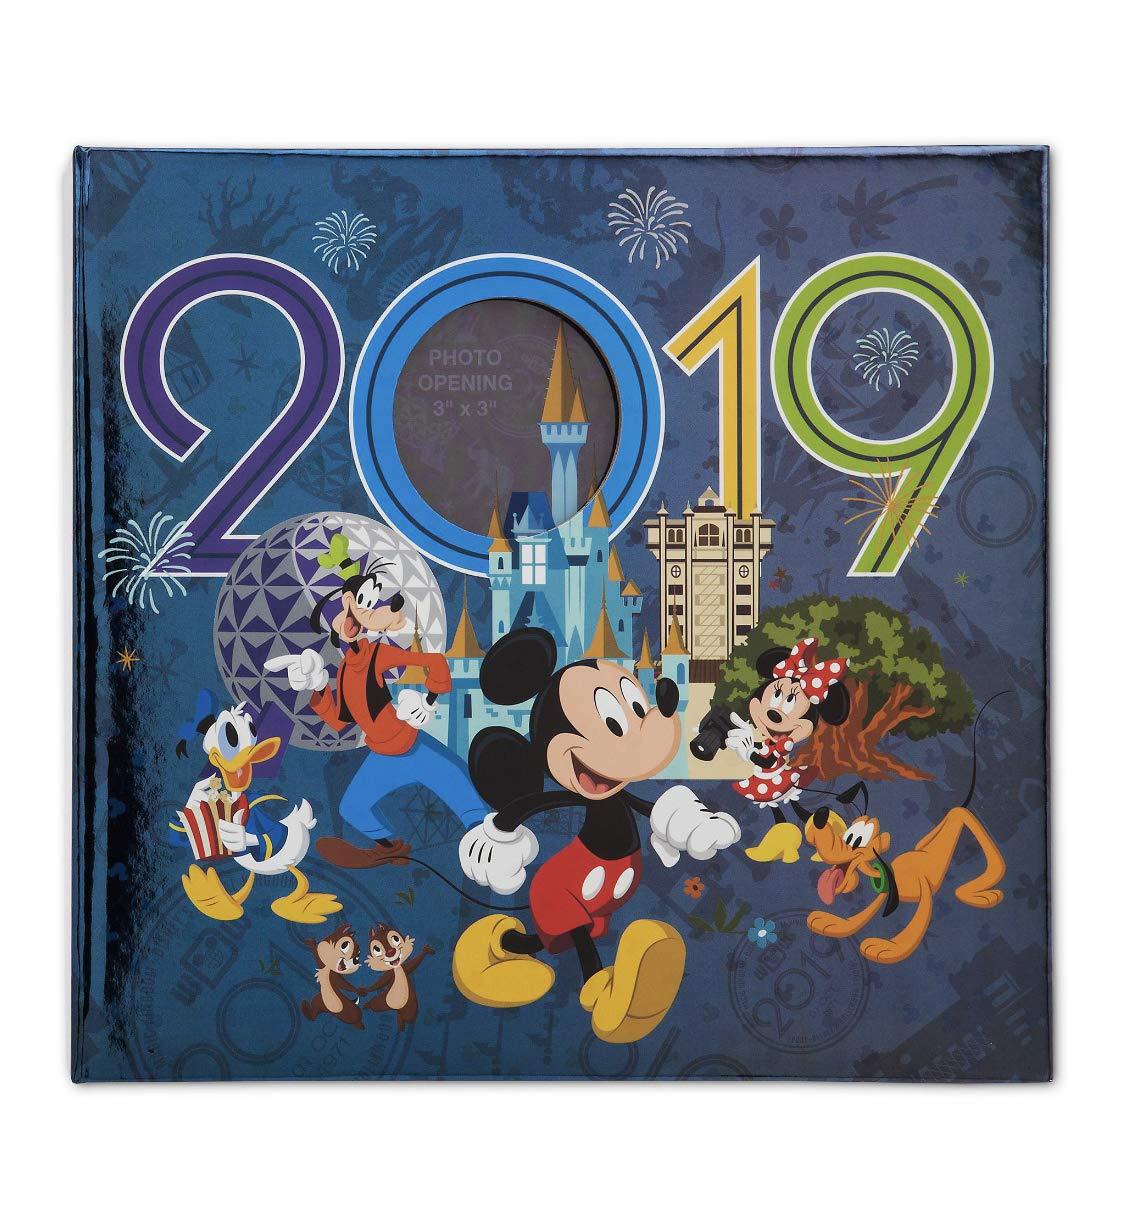 Walt Disney World 2019 Mickey Mouse Photo Album Holds 200 Photos by